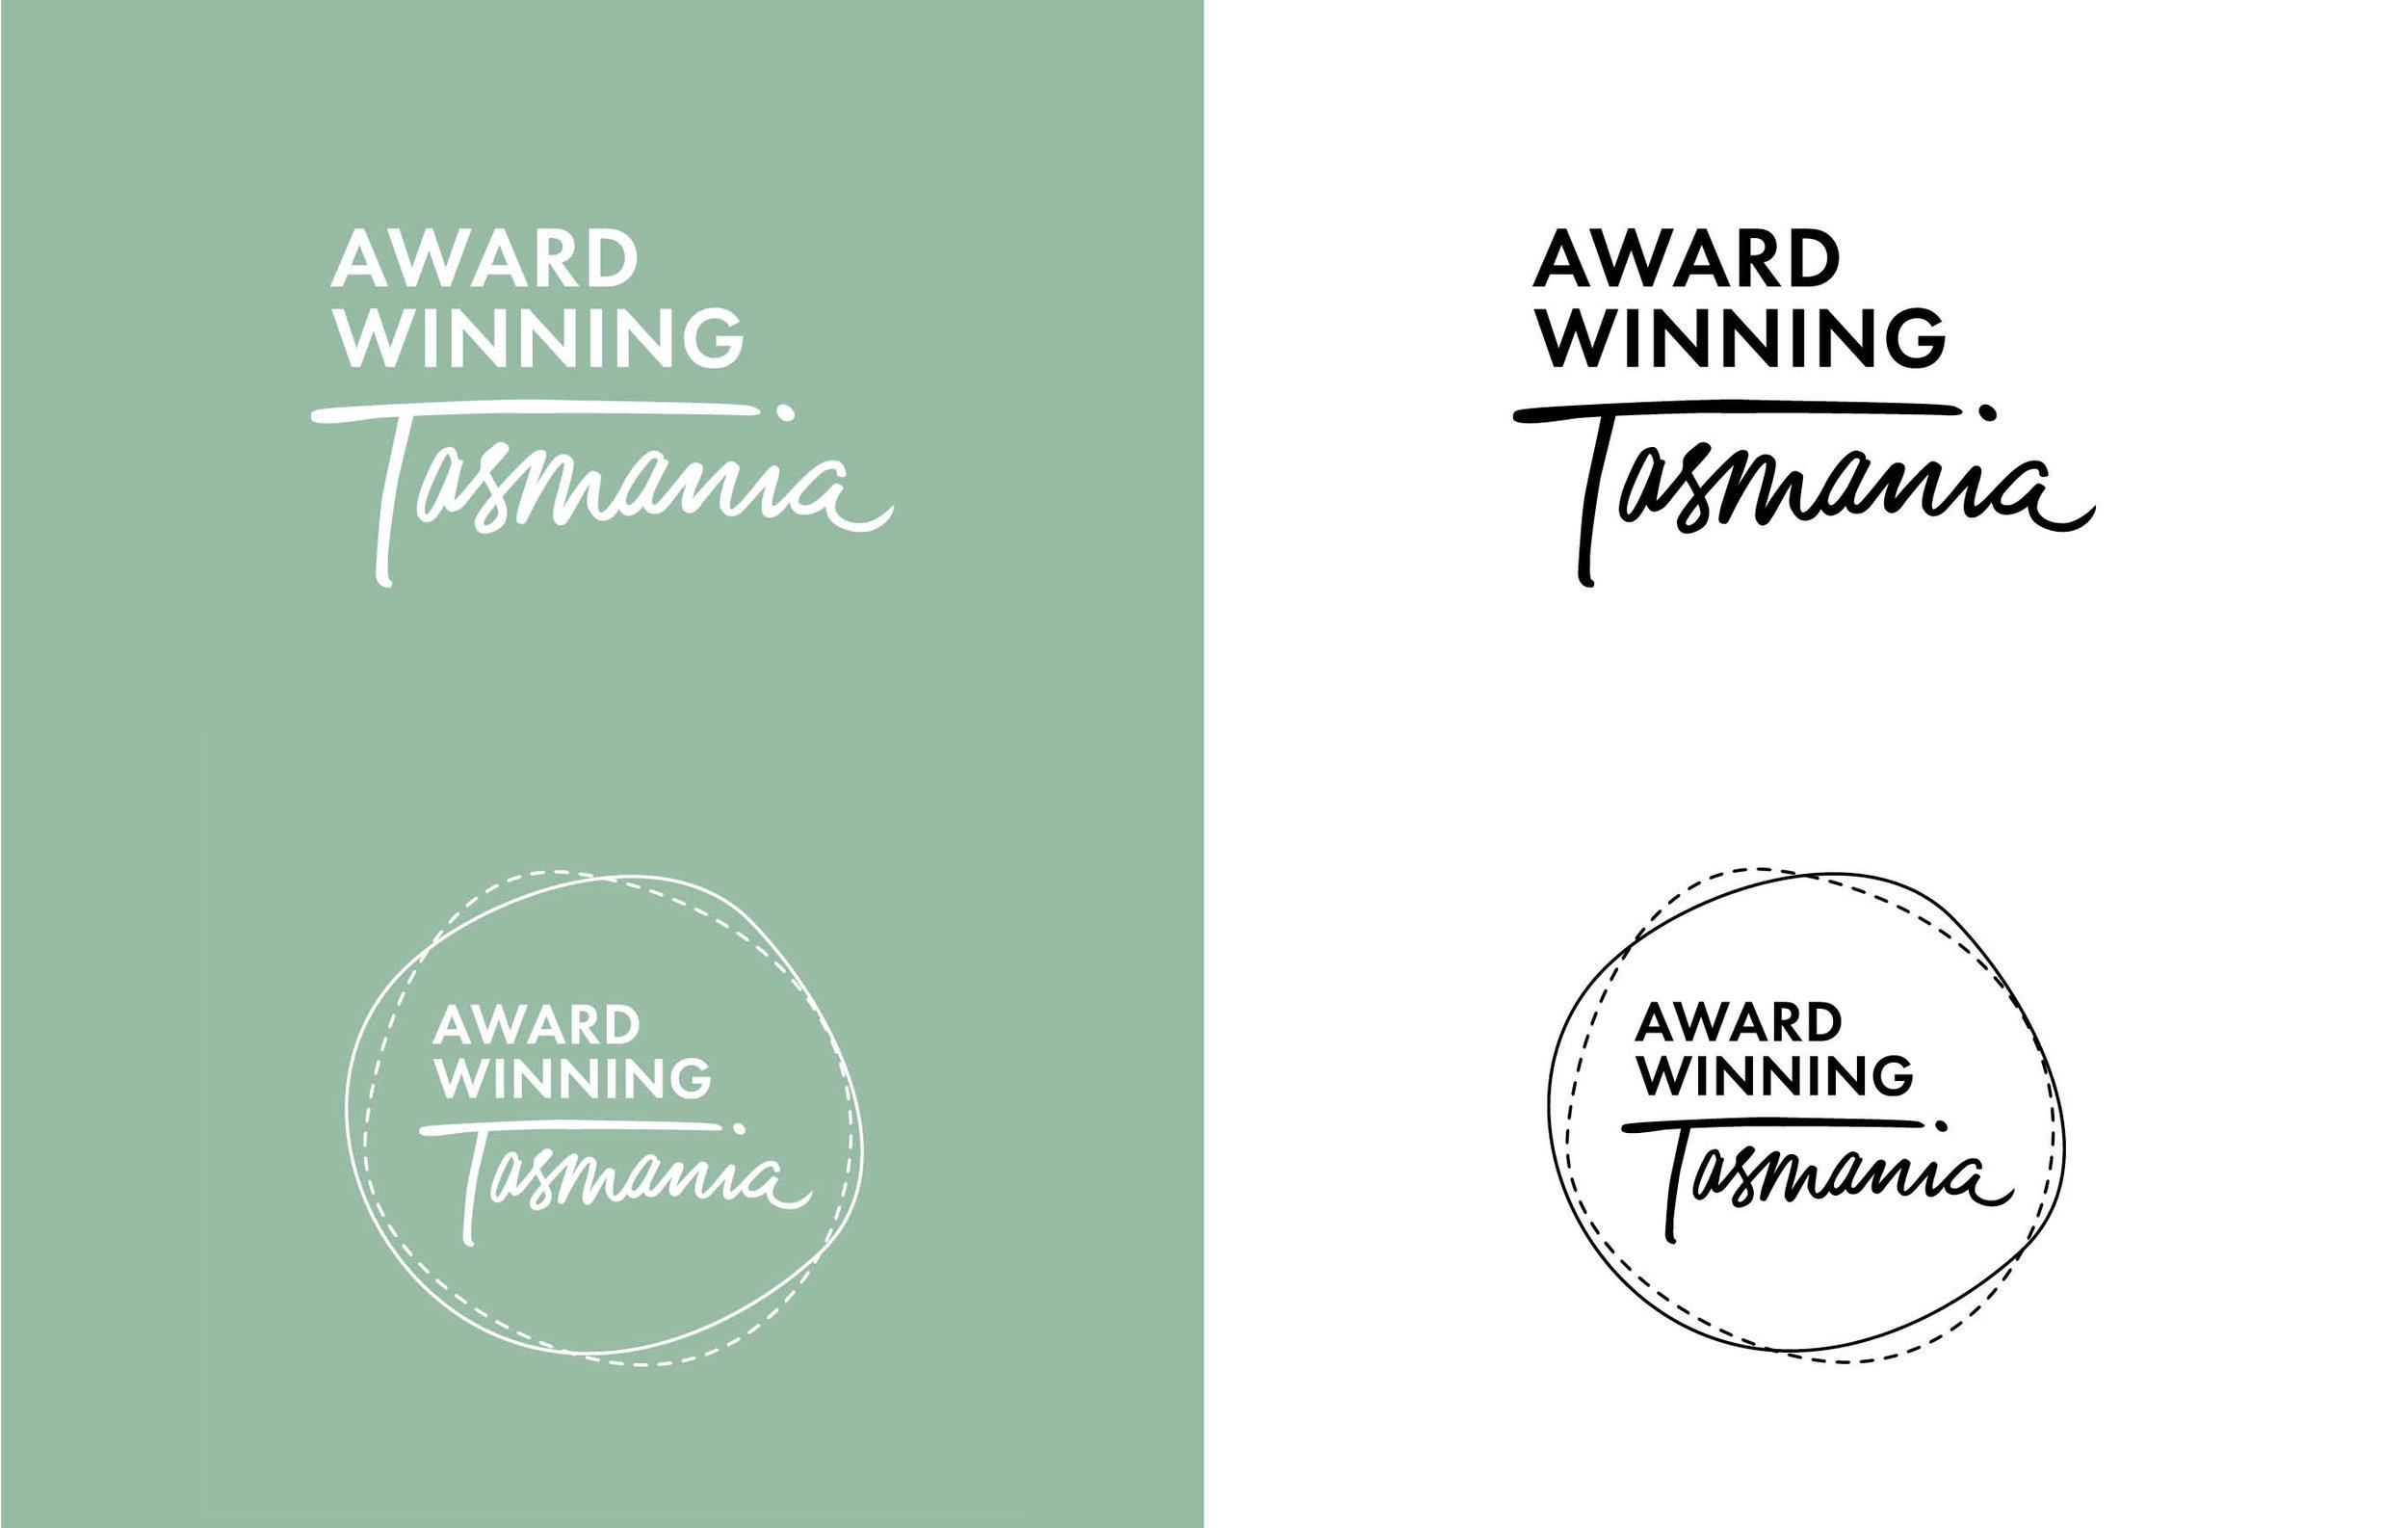 CultivateWeb_AwardWinningTasmania_Blog2.jpg